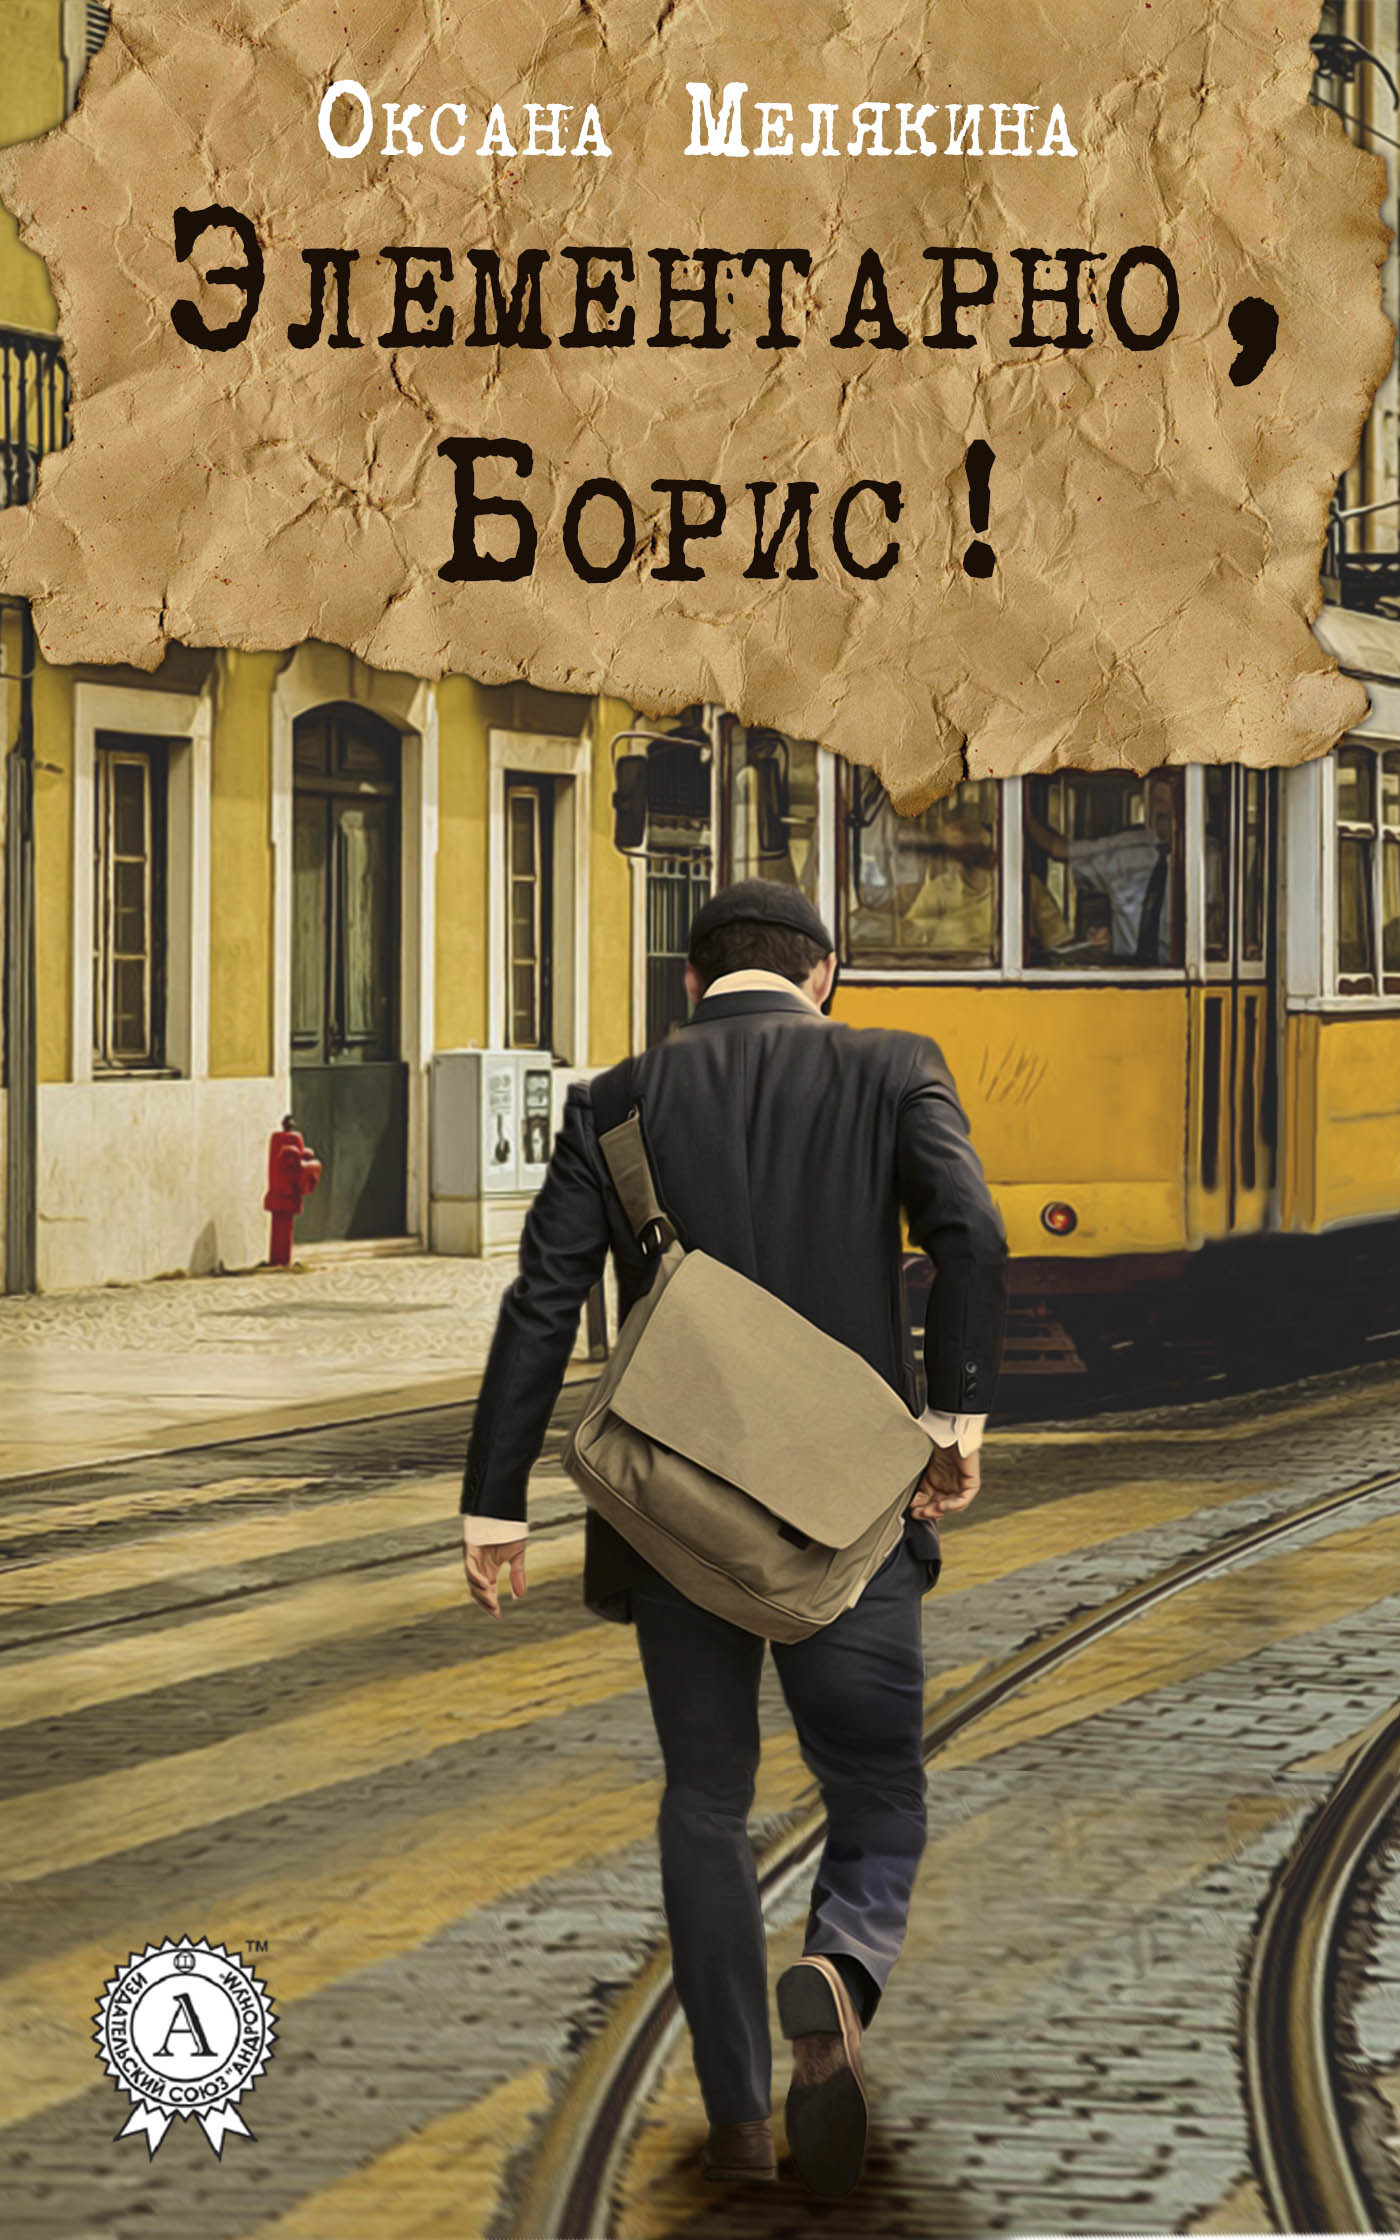 Оксана Мелякина - Элементарно, Борис!